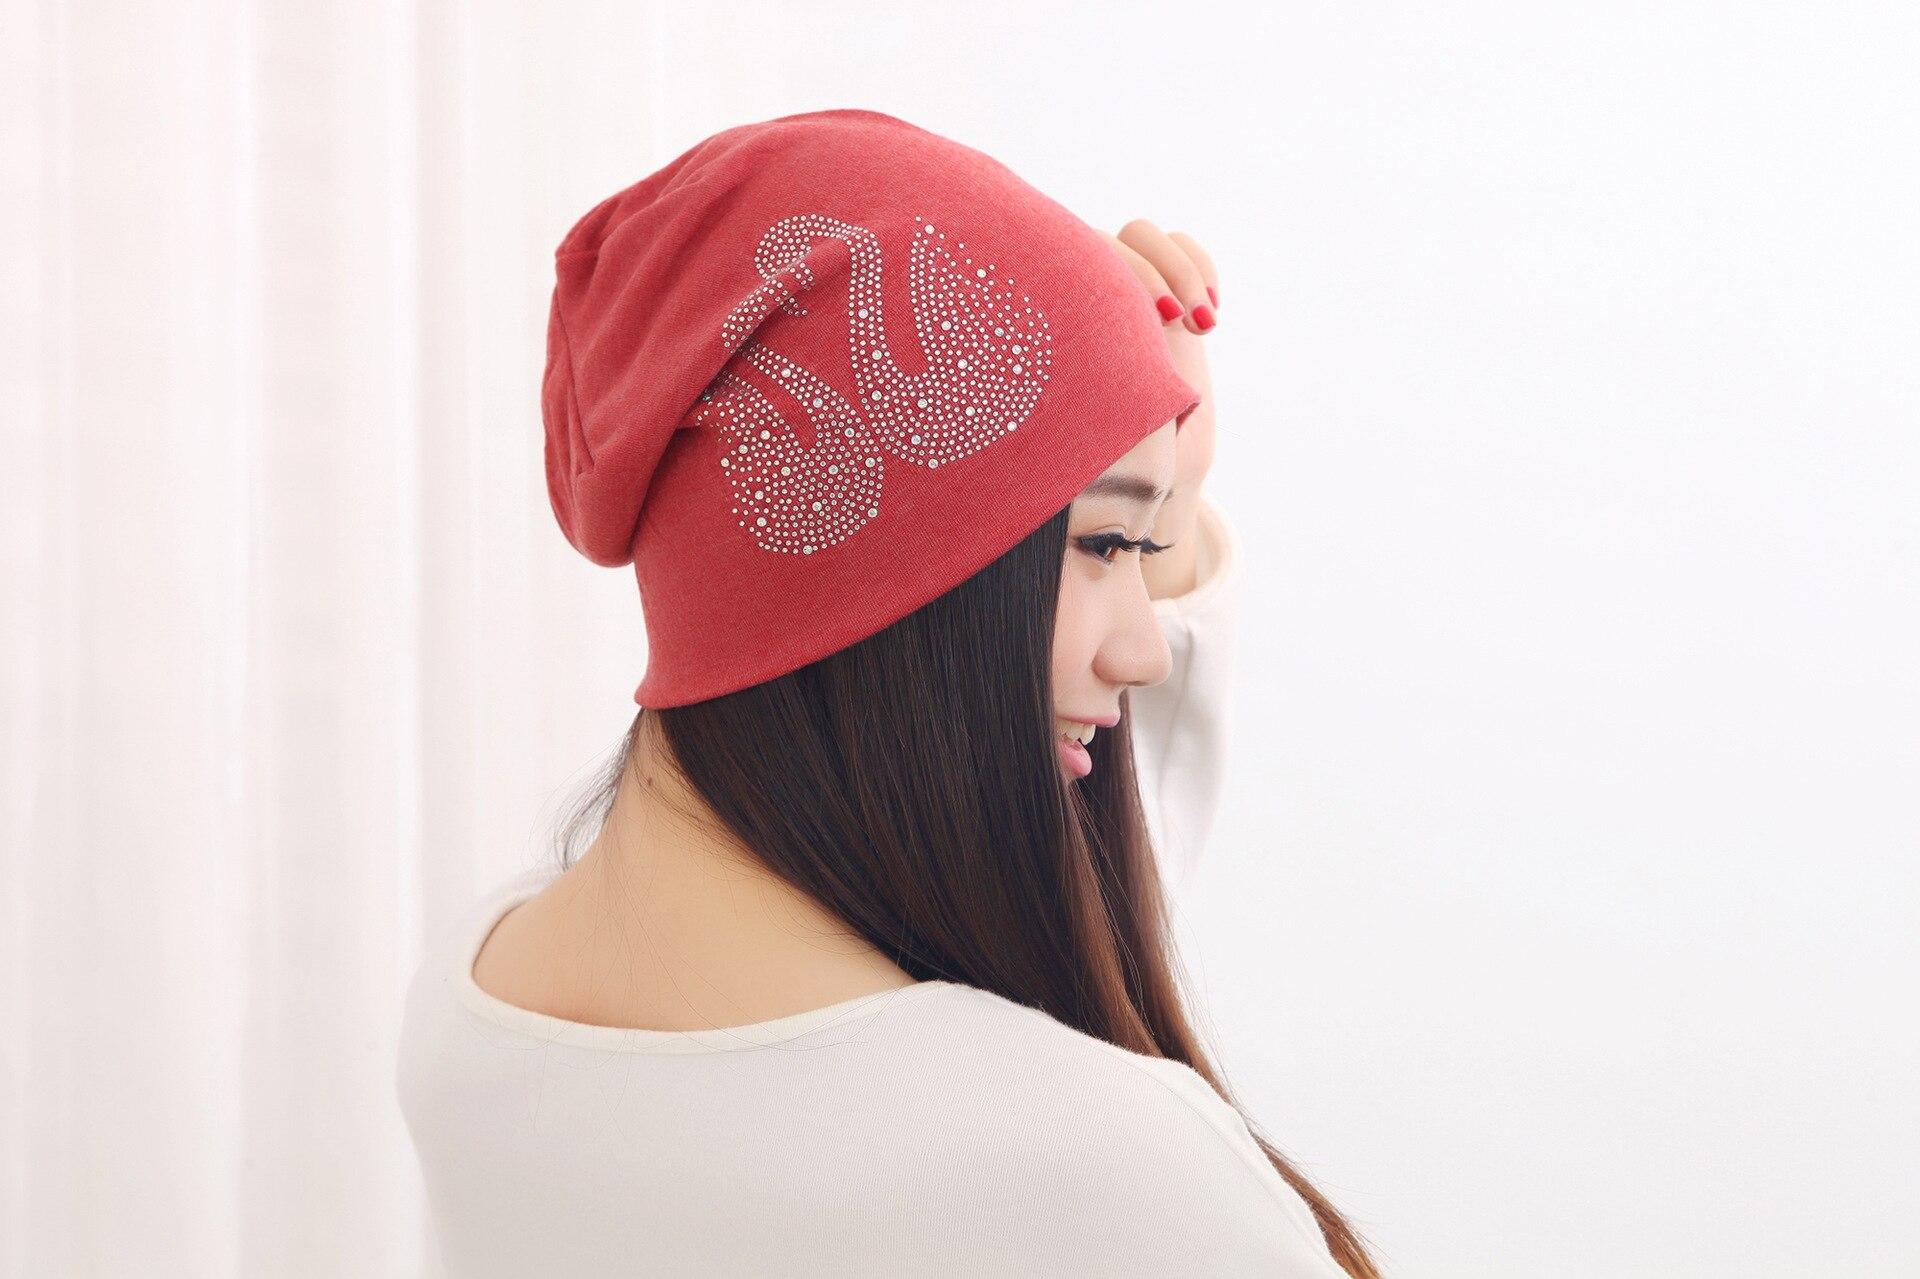 Autumn Winter Cotton Women Beanies with Set Auger Swan Fashion Ladies Skull Knitted Caps Gorro Set Head Pile Cap GH-148